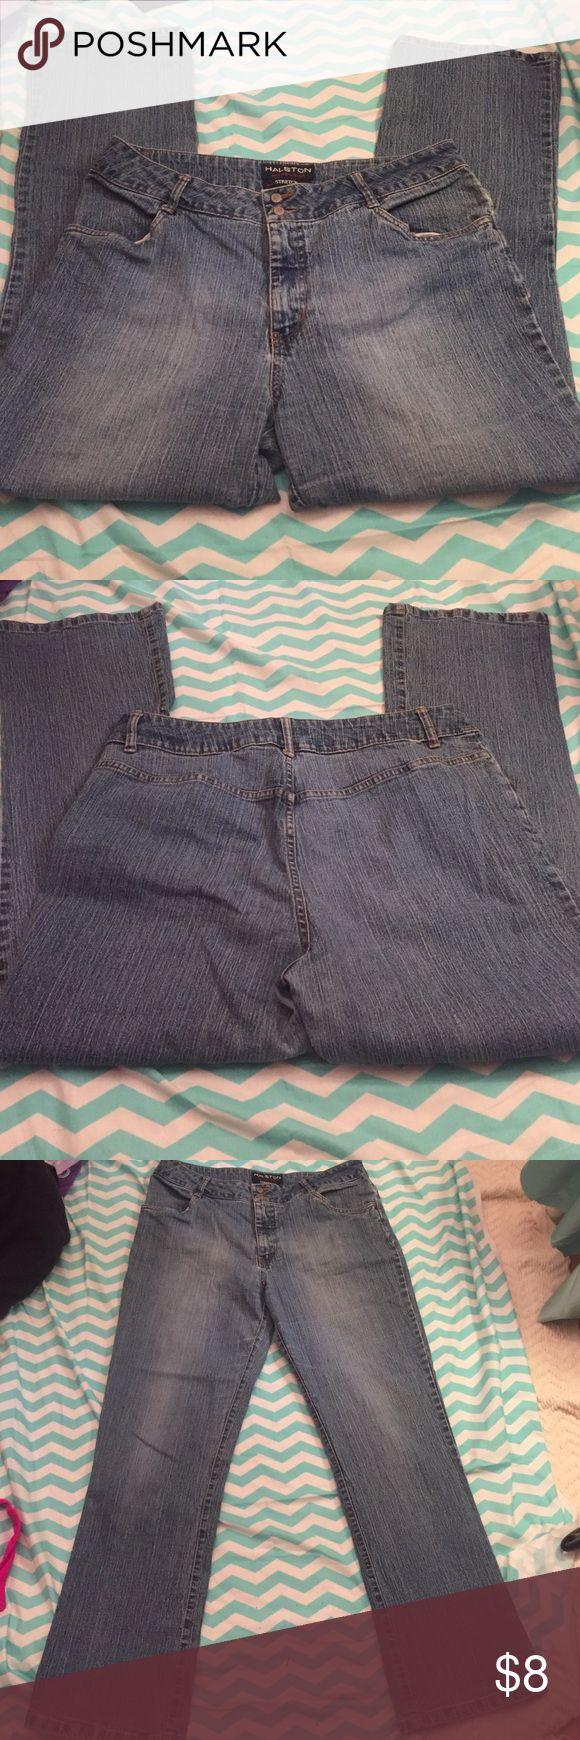 "❤️ Halston jeanswear stretch jeans Cotton/polyester/spandex. 30"" inseams. Halston  Jeans"